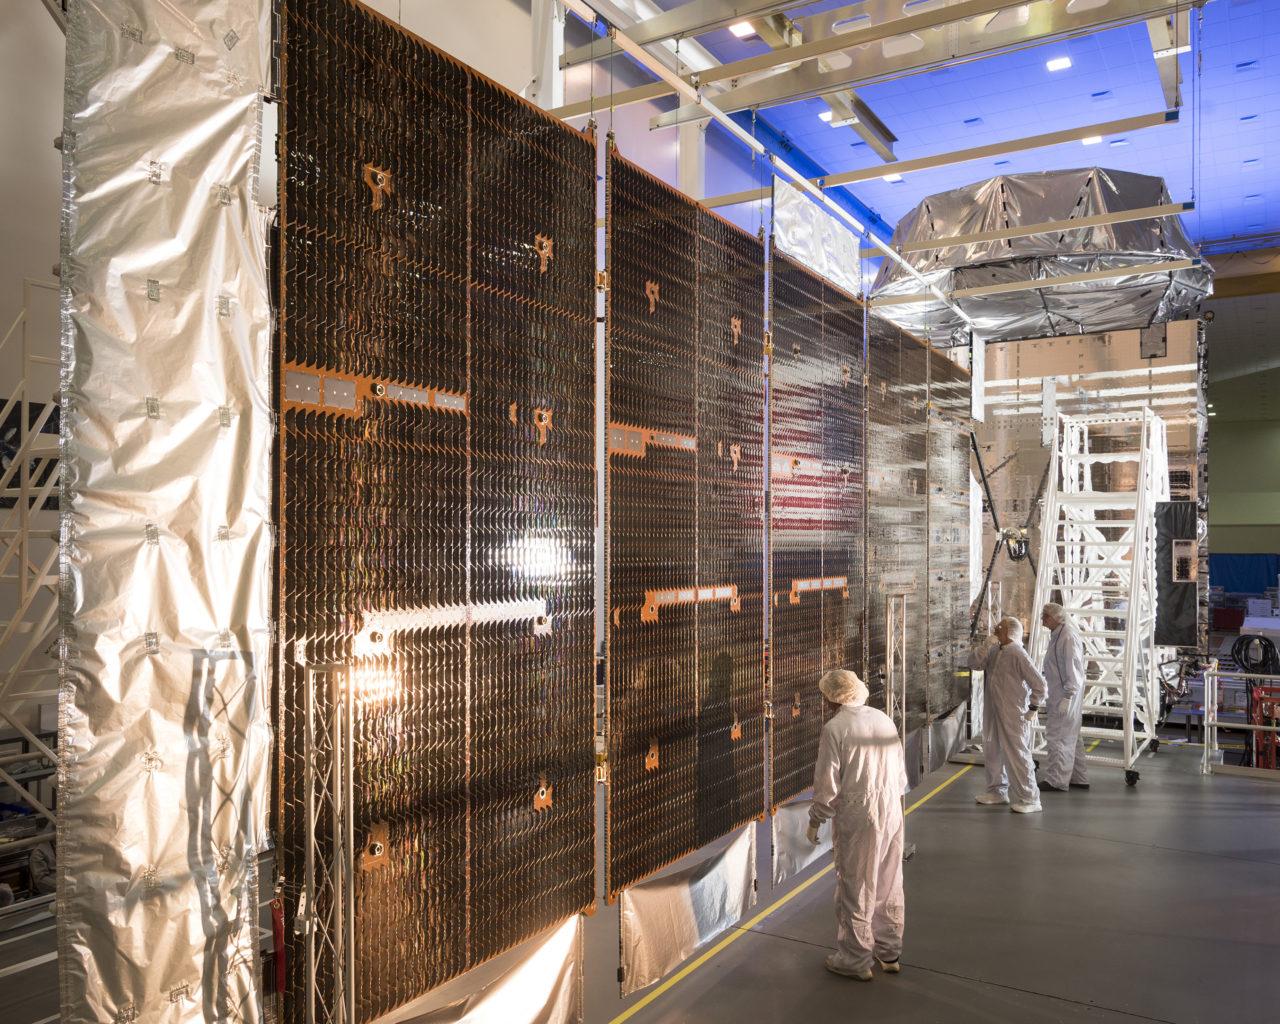 MUOS SV 3 (MUOS 5) final SAWA installation at Lockheed's satellite manufacturing facility. Photo: Lockheed Martin.